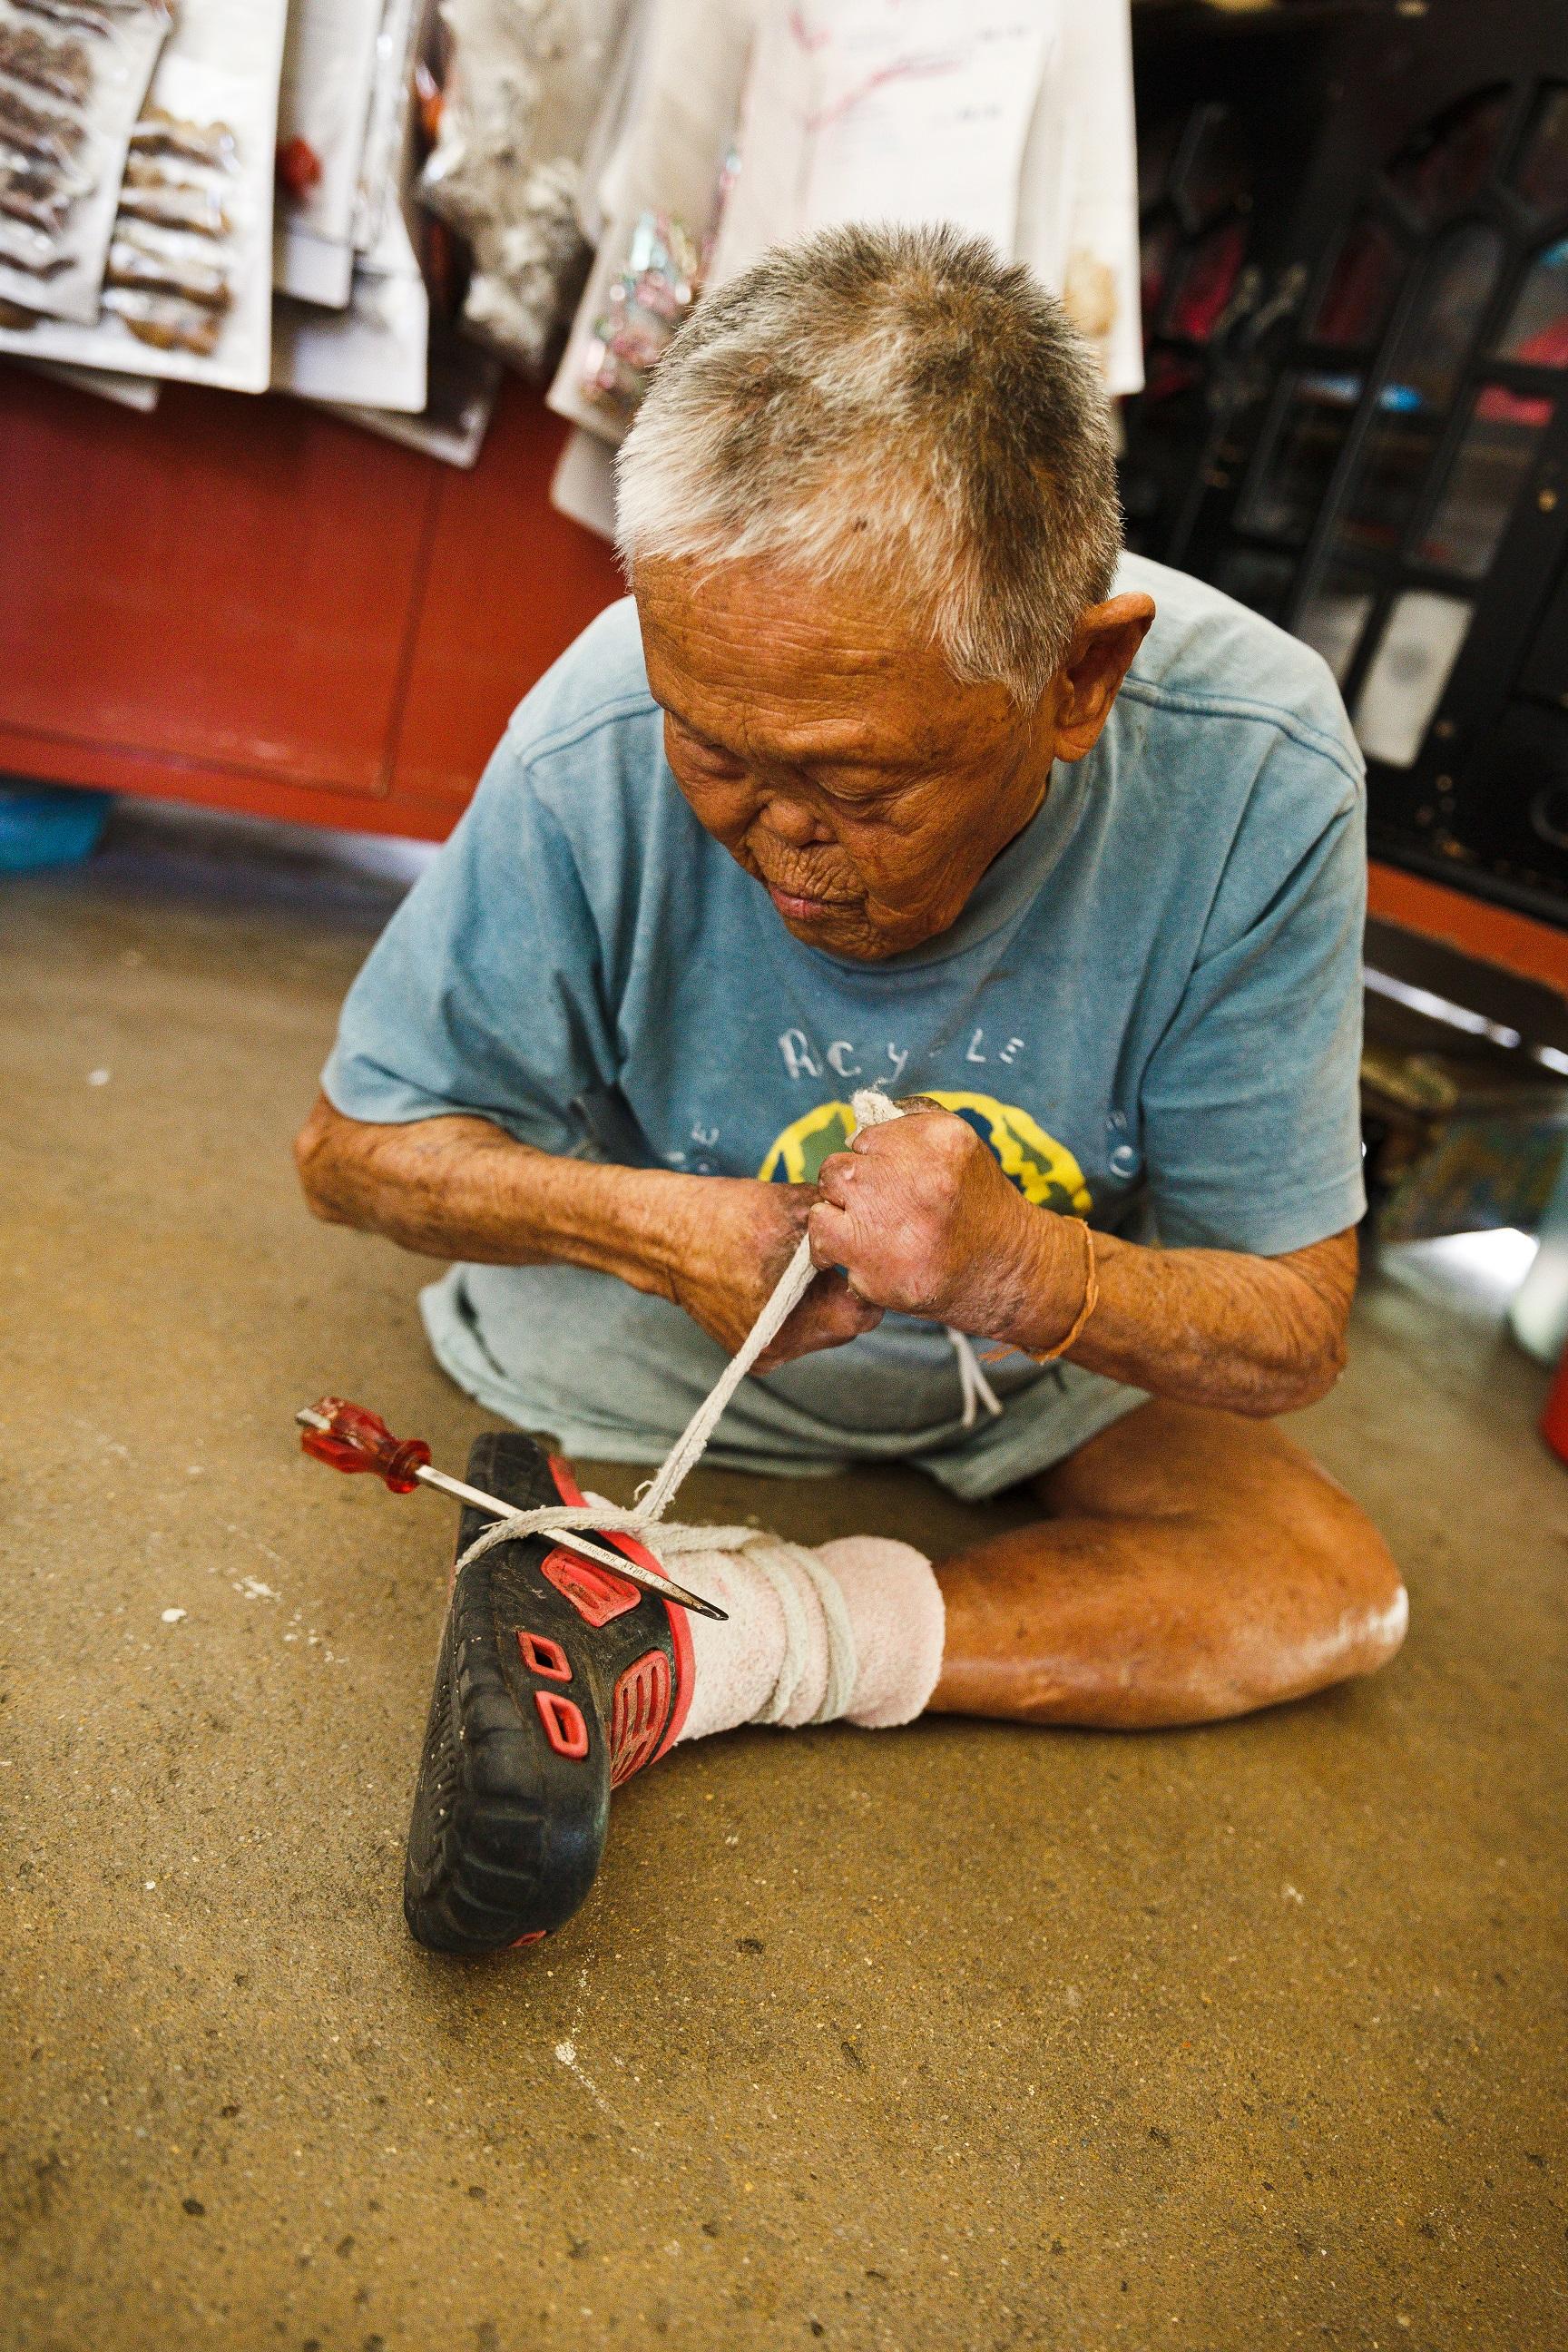 Low dresses his foot himself each day. (photo by Mango Loke)